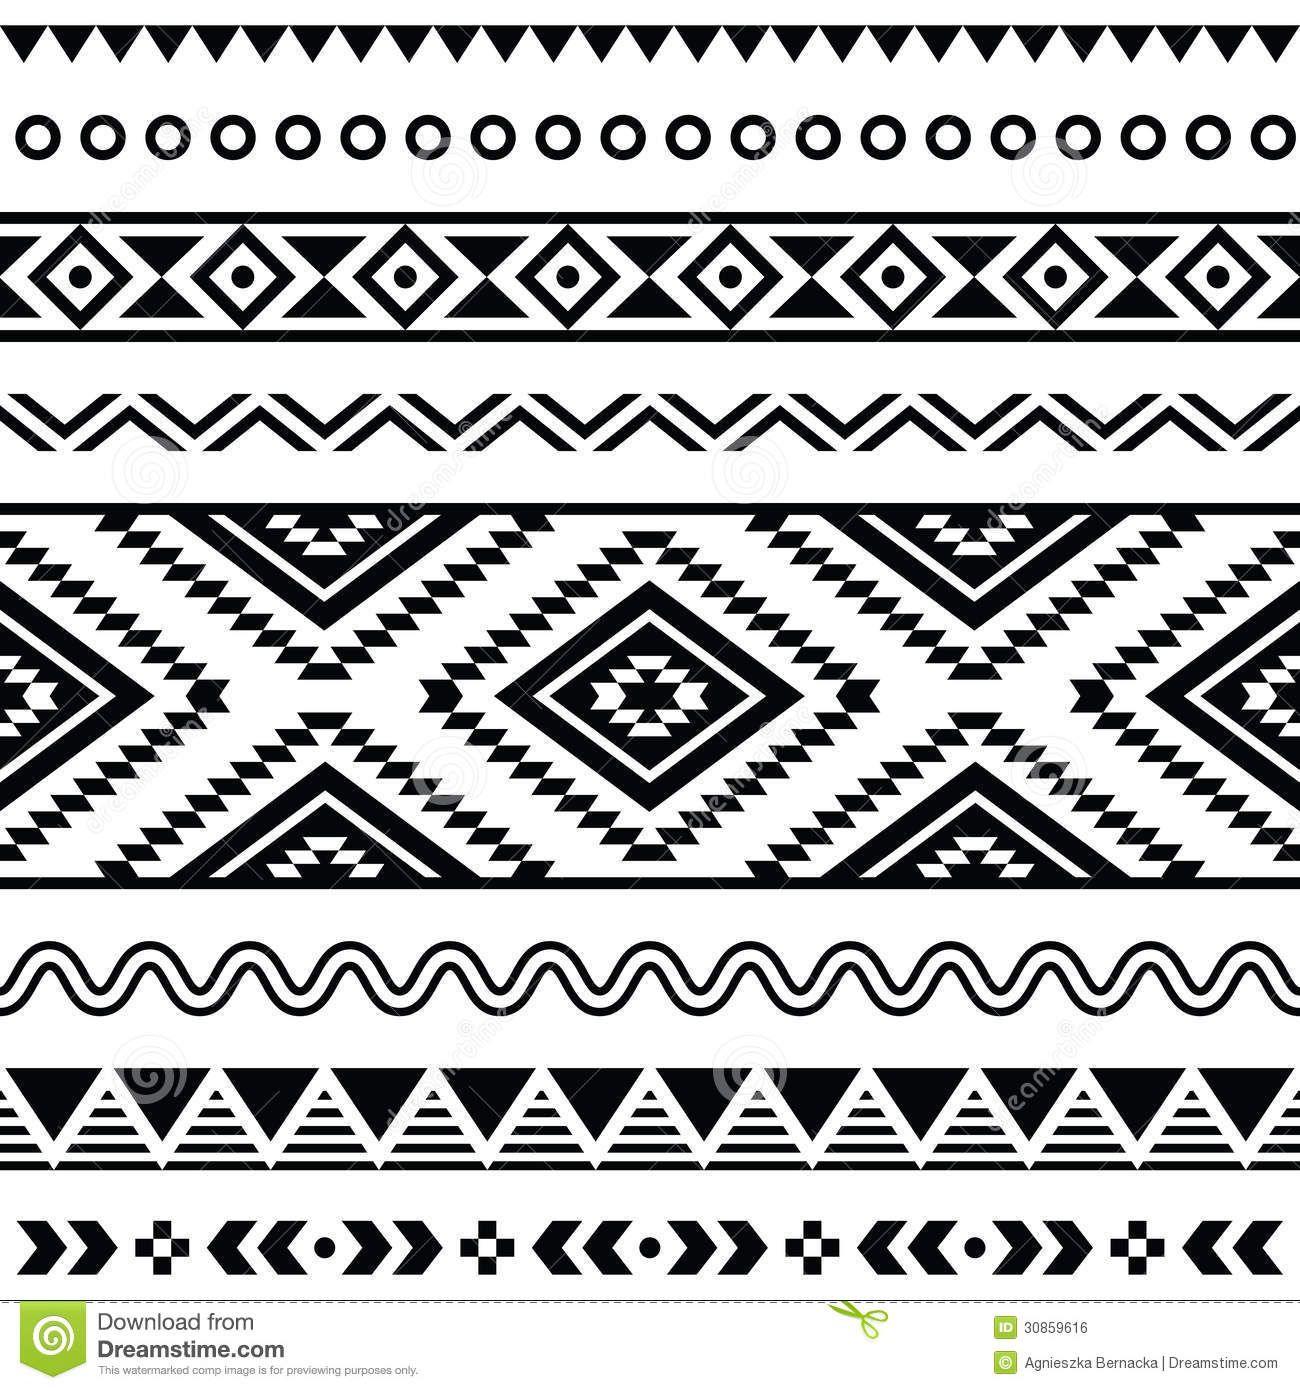 Aztec clipart tribal print. Free southwest clip art